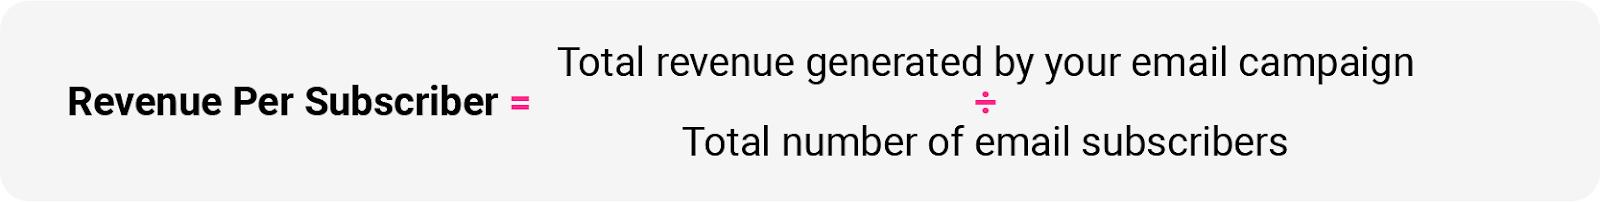 email_marketing_revenue_per_contact